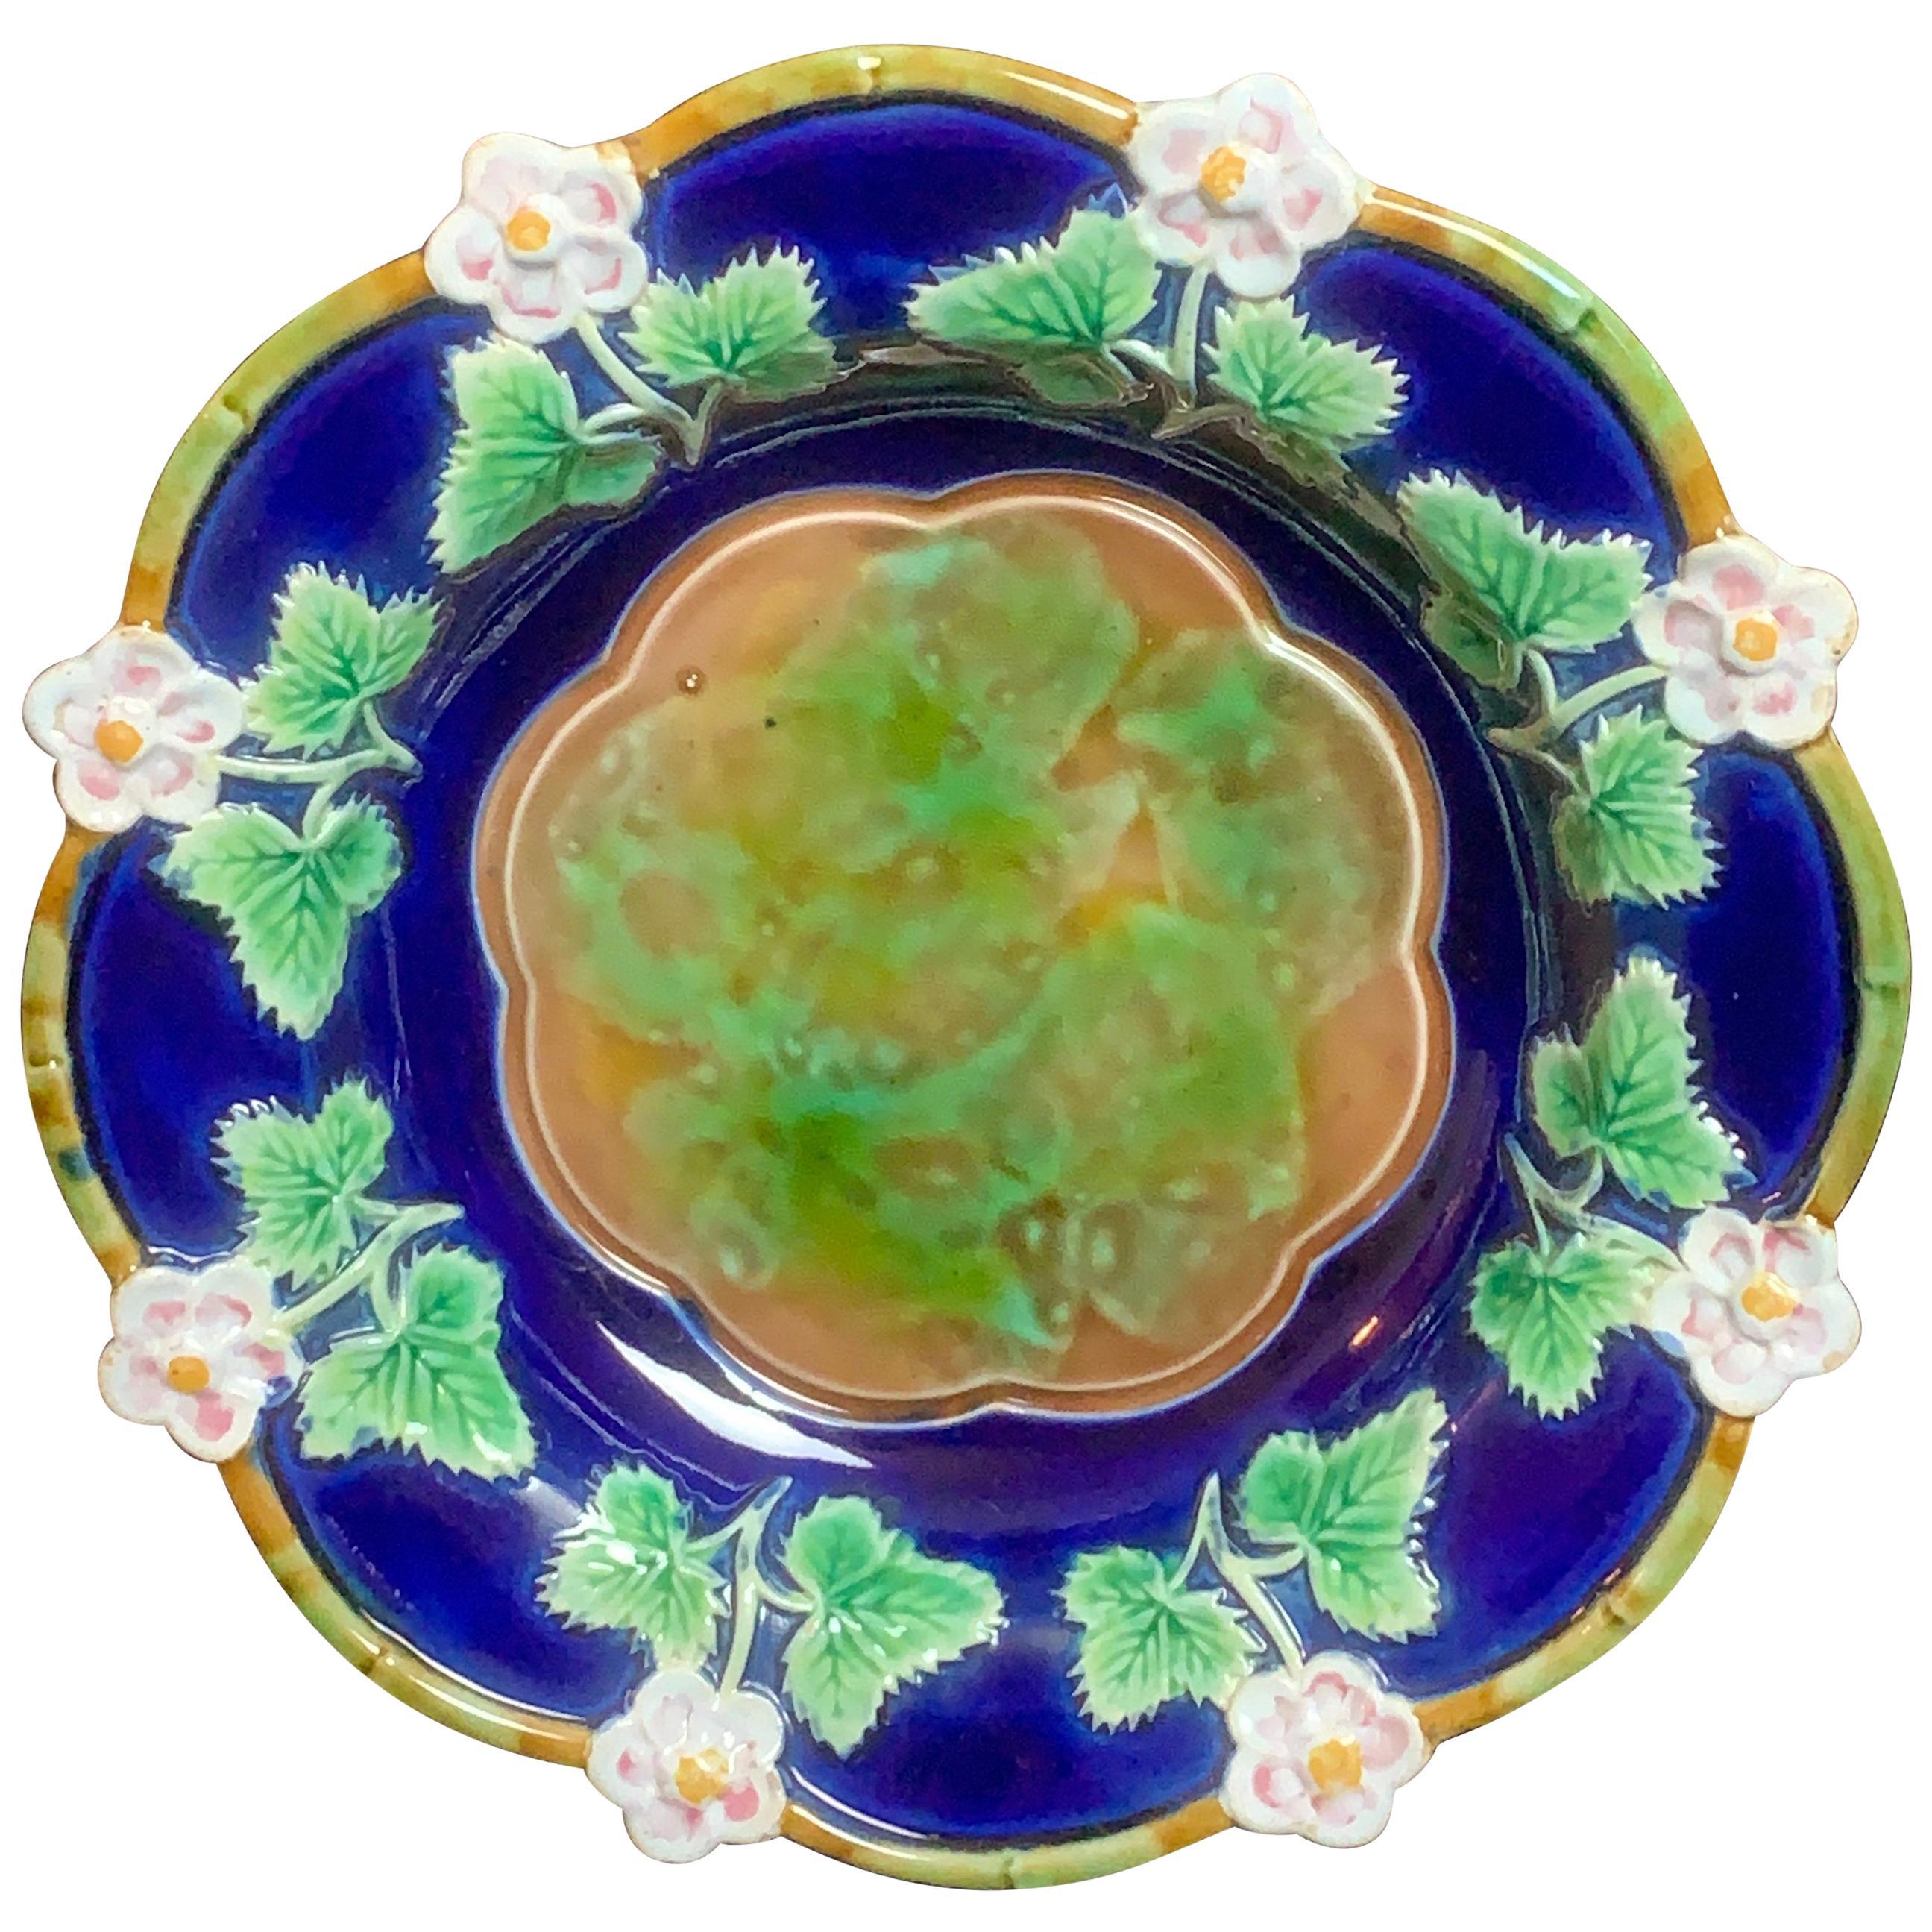 George Jones Majolica Strawberry Dish in Cobalt Blue, English, circa 1875